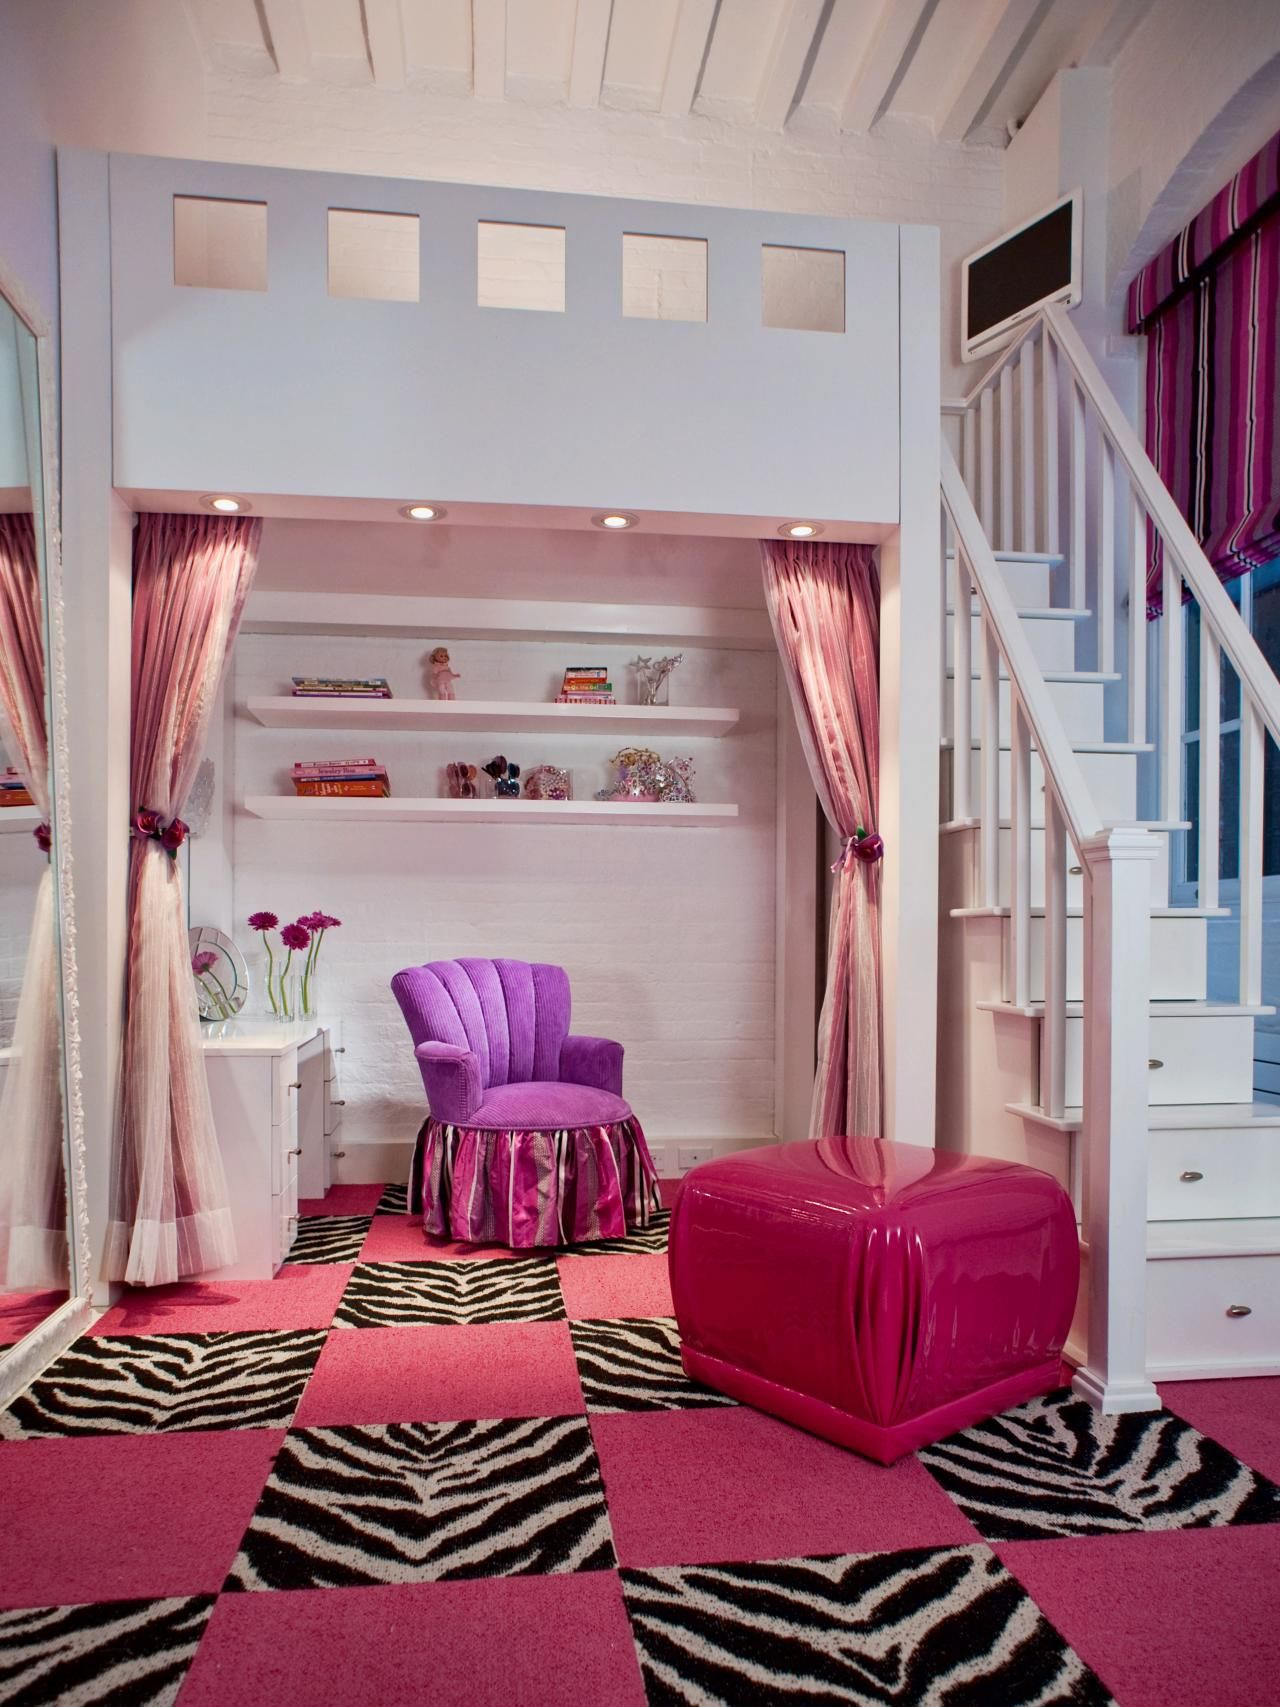 Lovely Stylish Kidsu0027 Bunk Beds | Kids Room Ideas For Playroom, Bedroom, Bathroom |